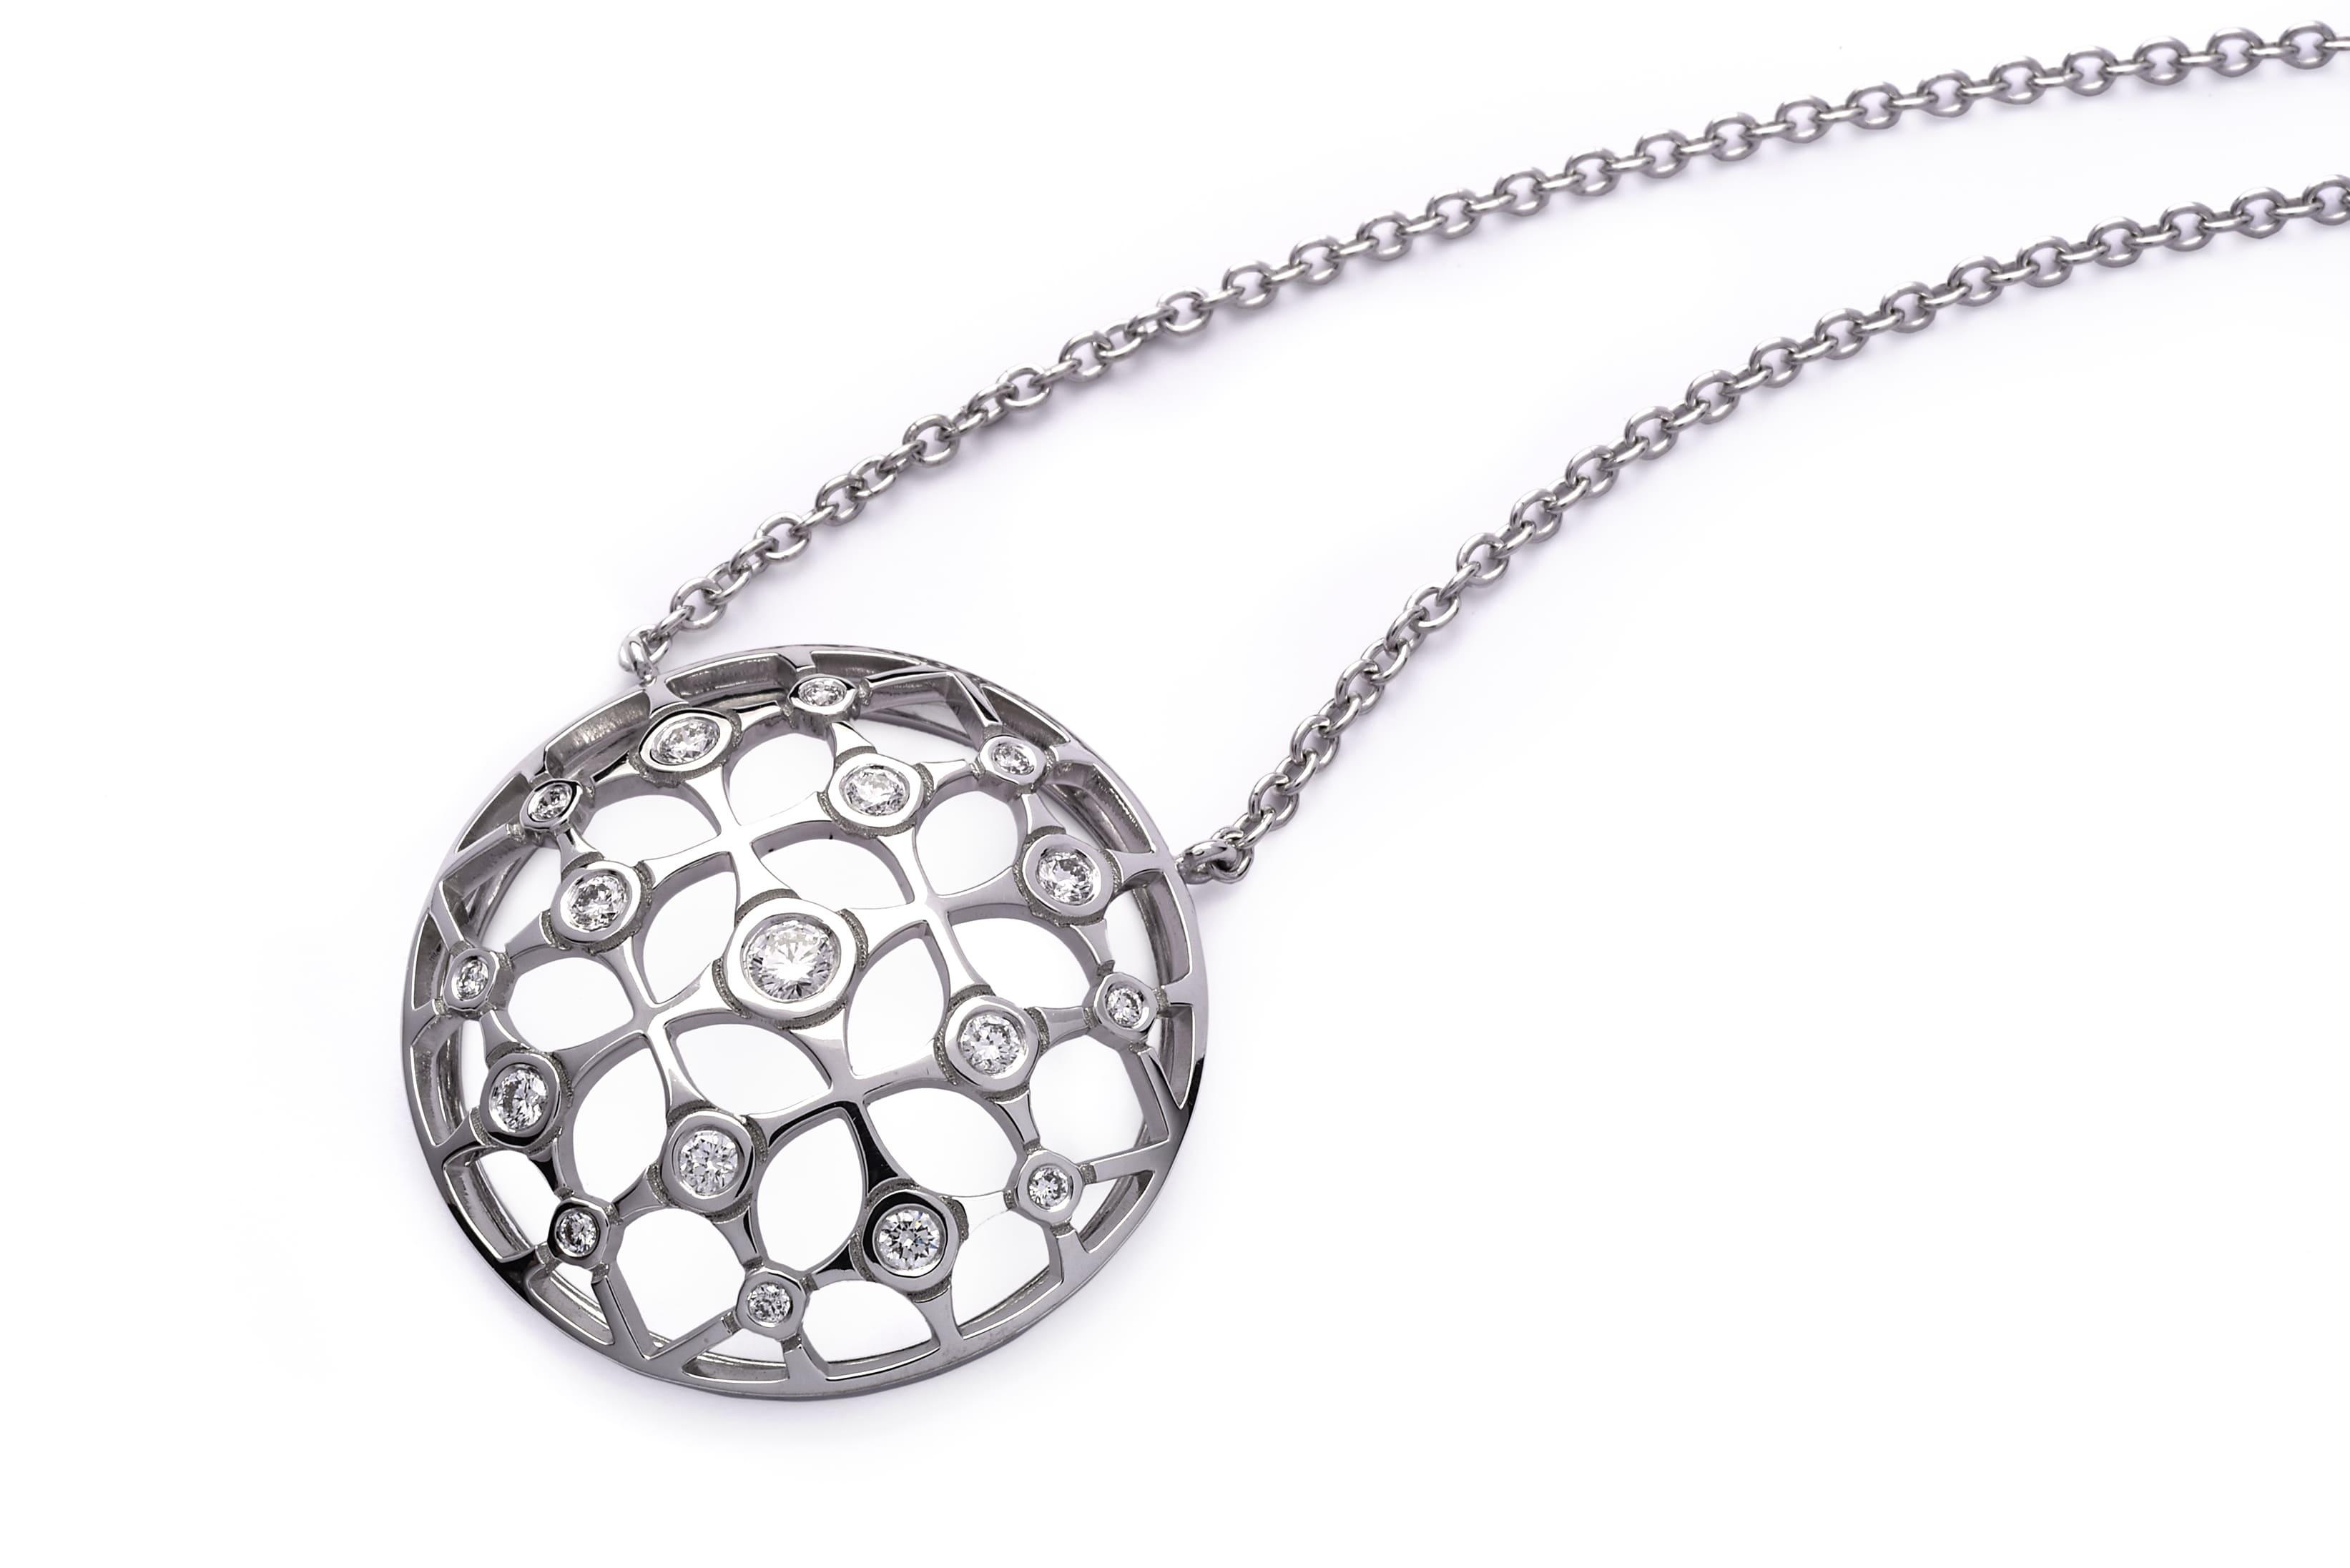 colgantes de oro y diamantes_ramon jewellers (5)